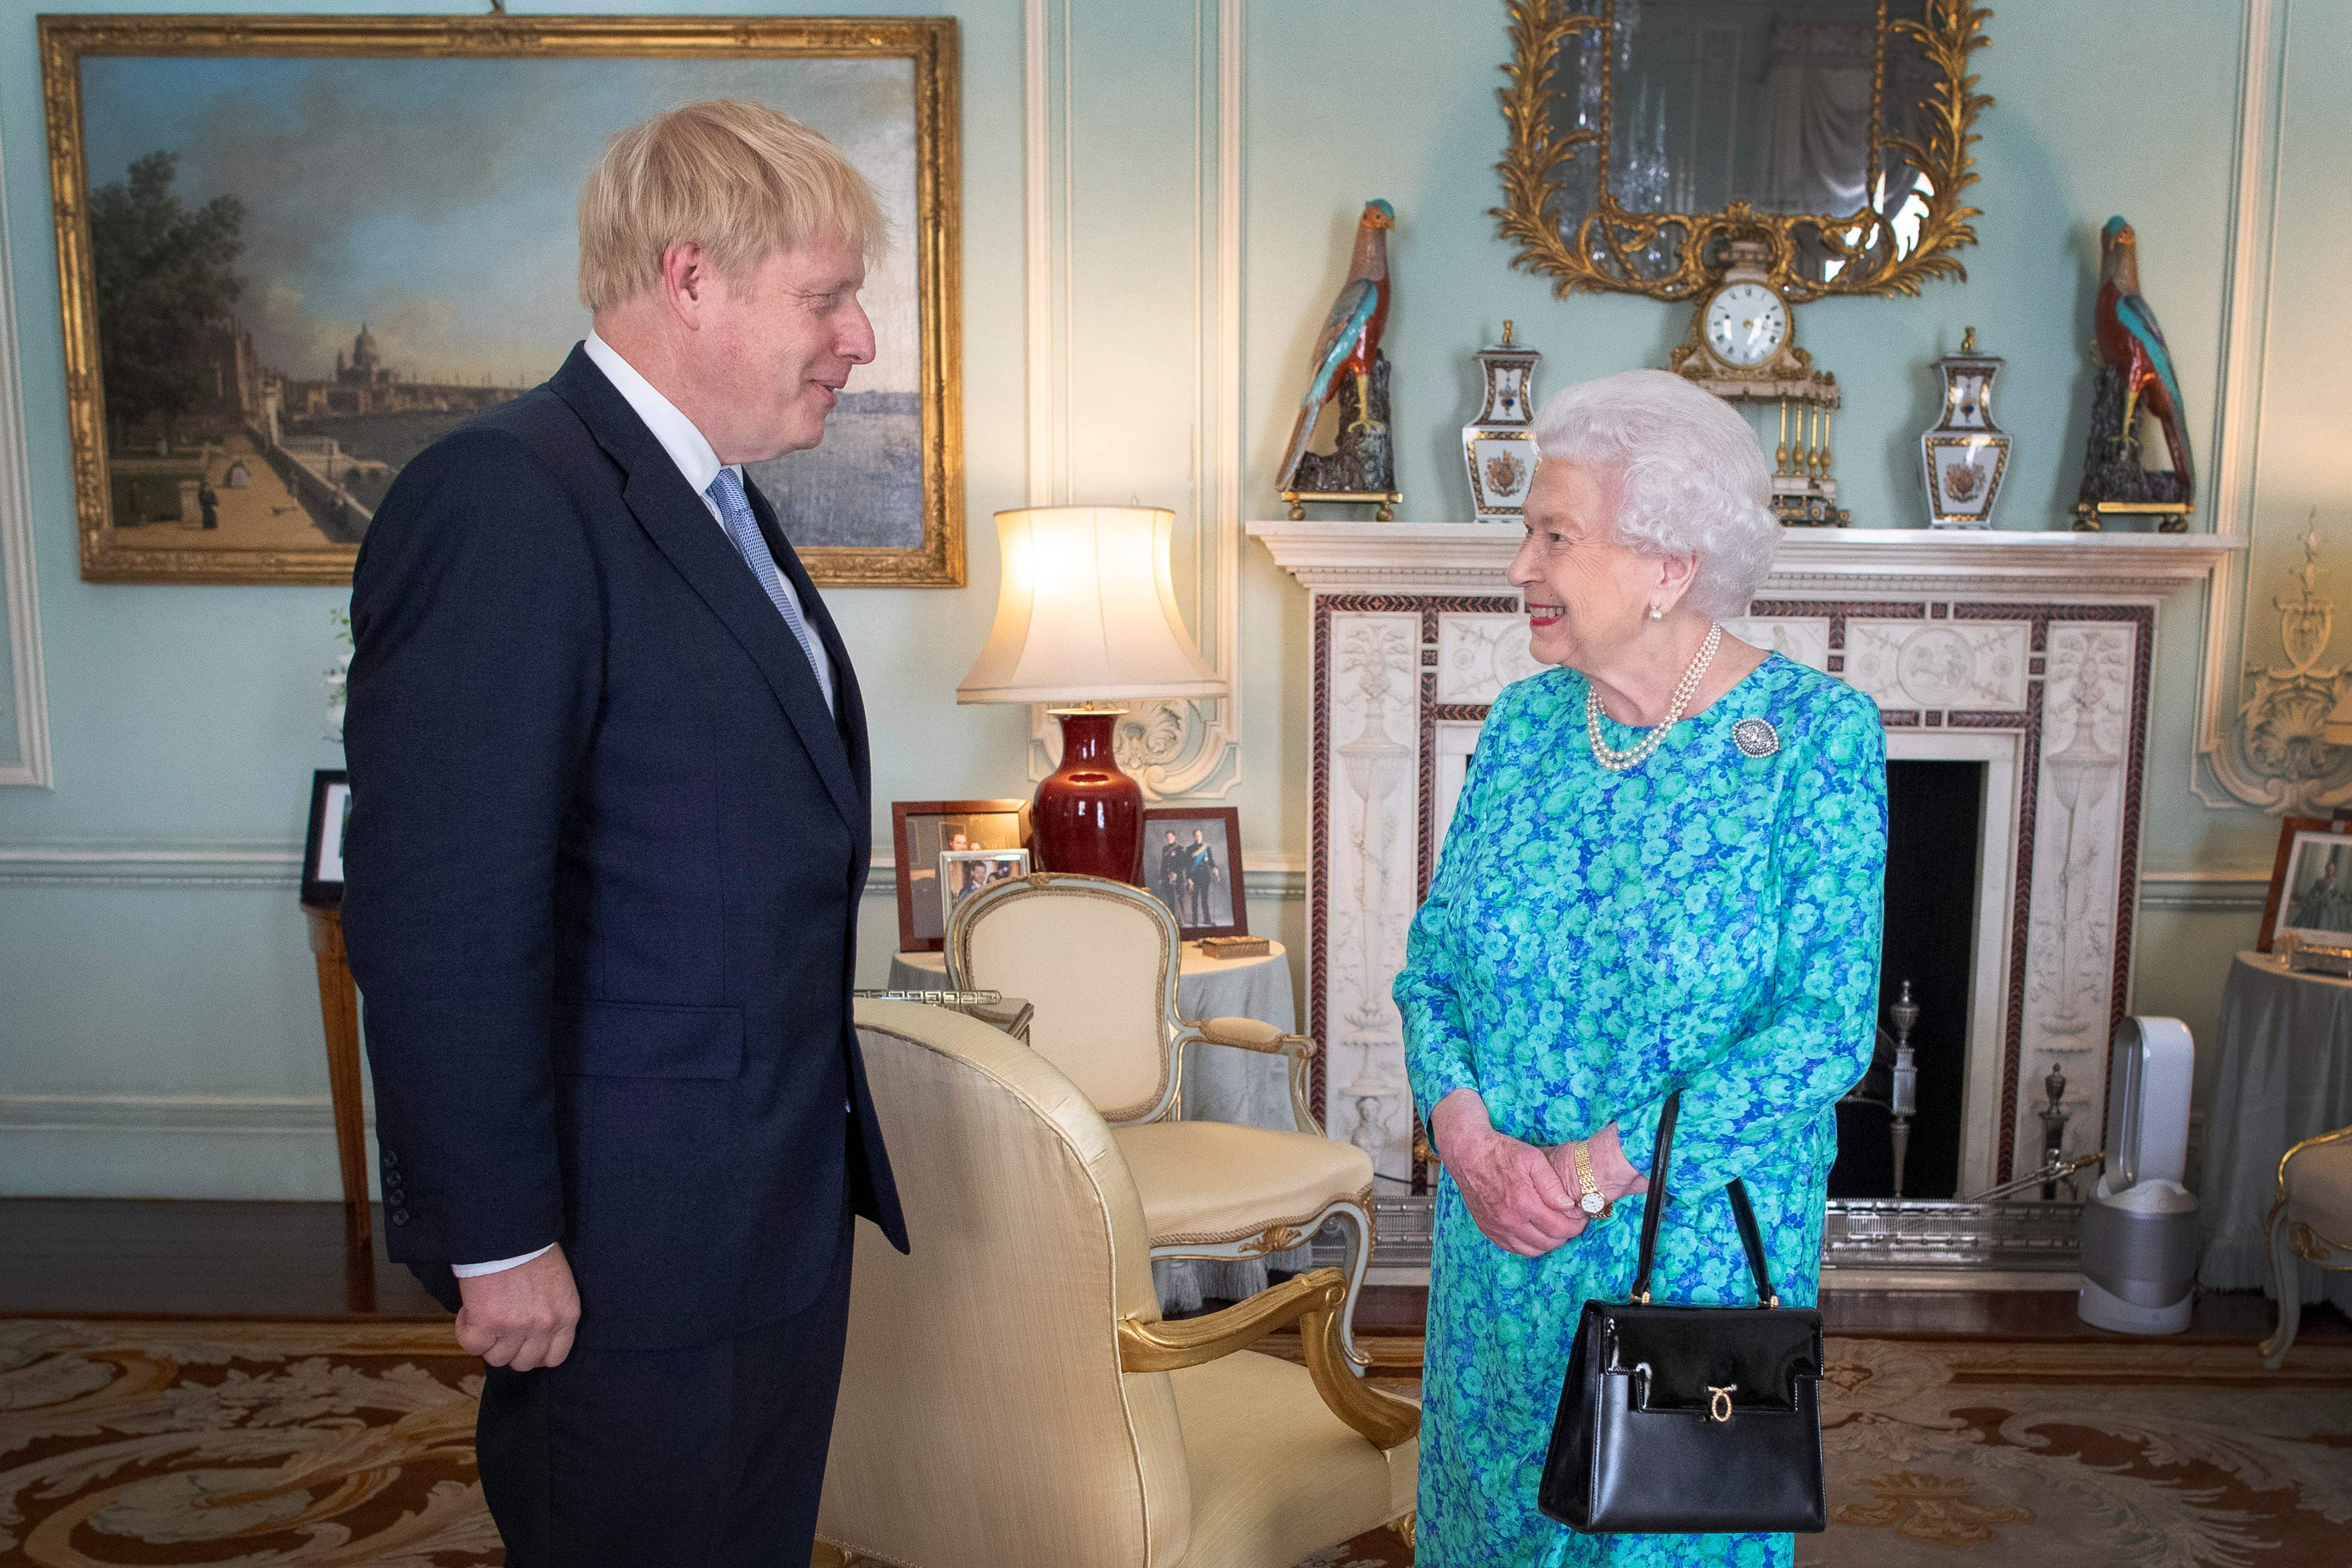 Boris Jonhson, Rainha Elisabeth, Parlamento britânico, Brexit, União Europeia